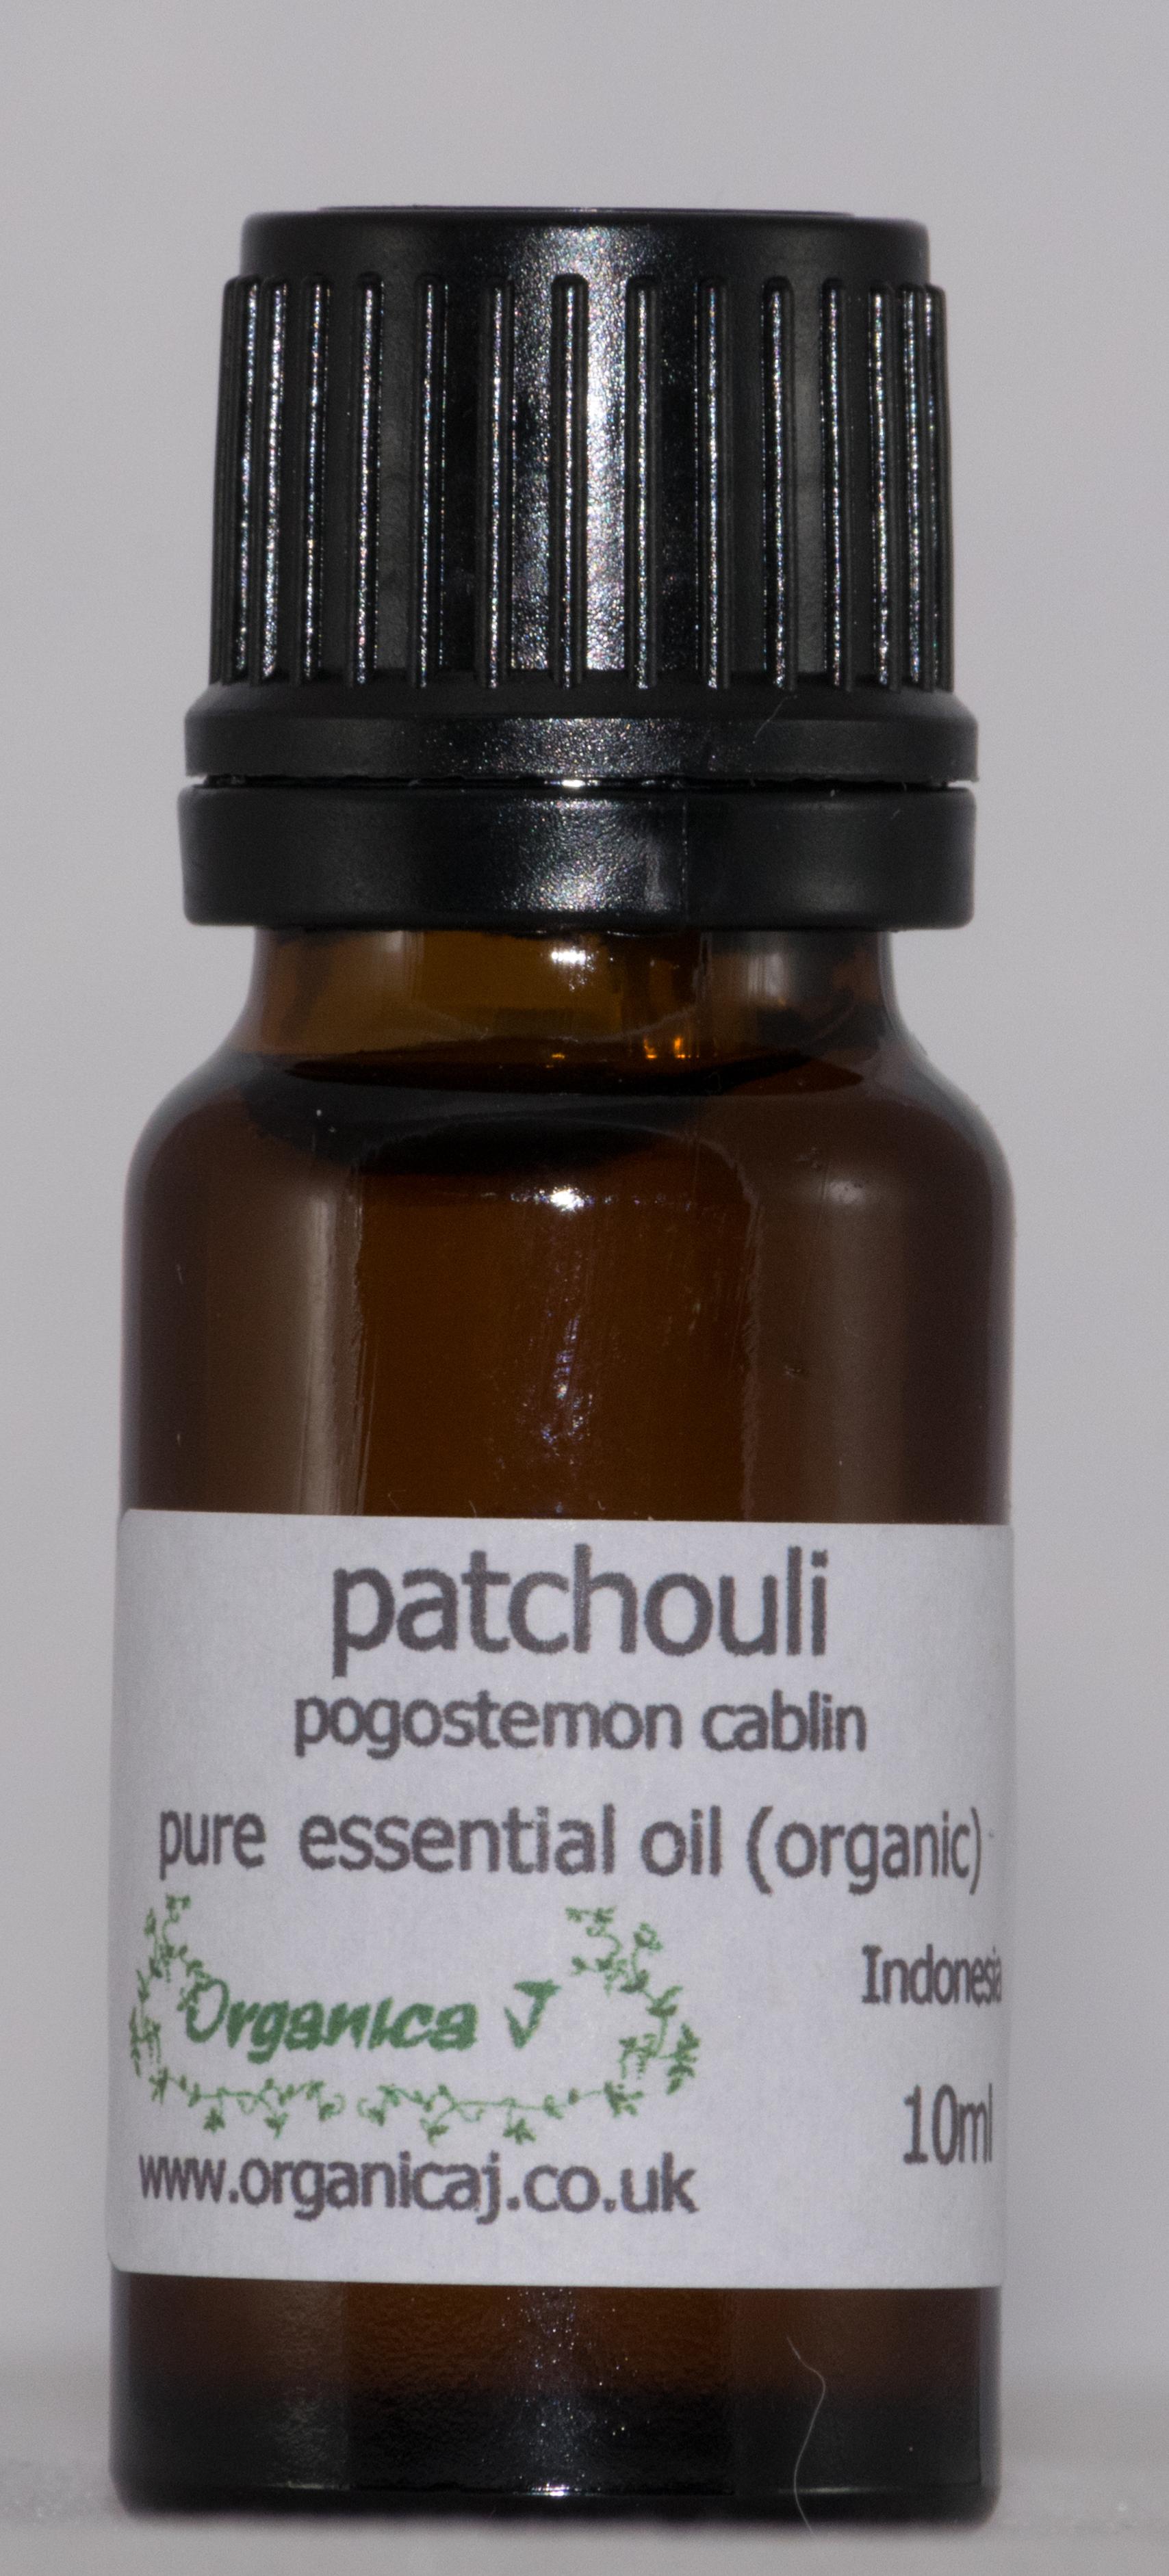 Patchouli (pogostemon cablin) 0E0012